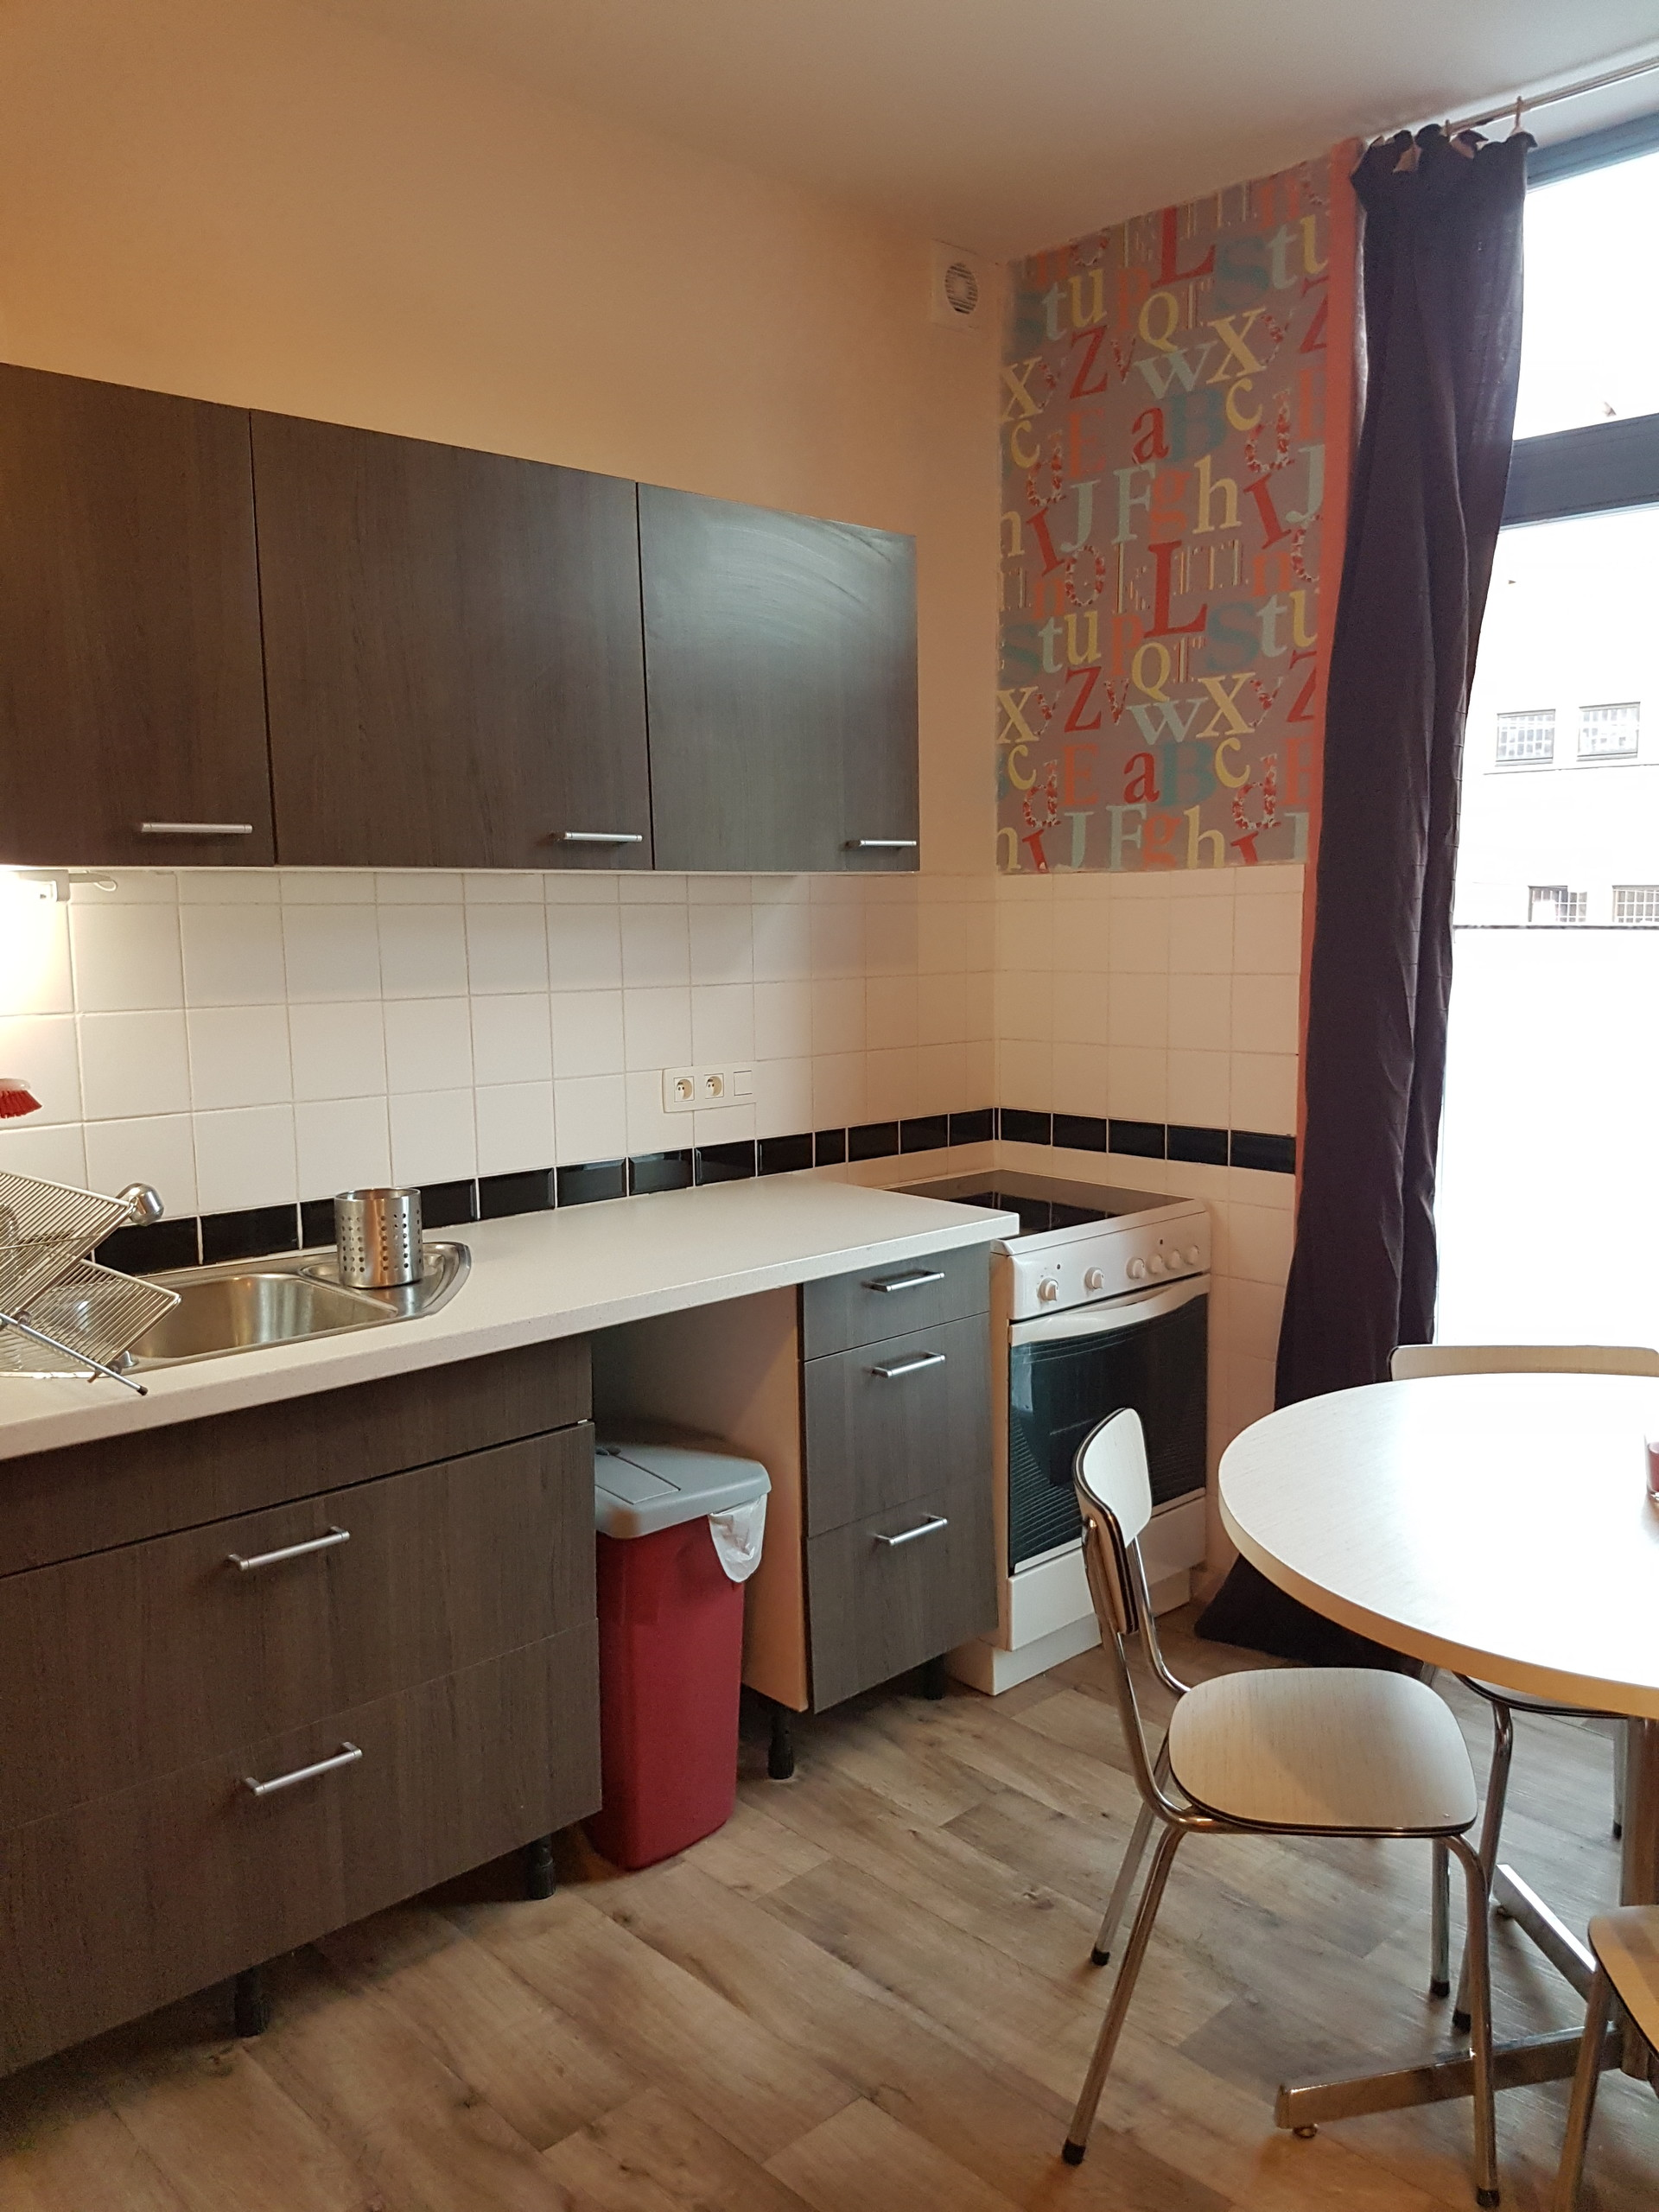 Salle De Bain Cuisine ~ studio cuisine quip salle de bain partager 2 location